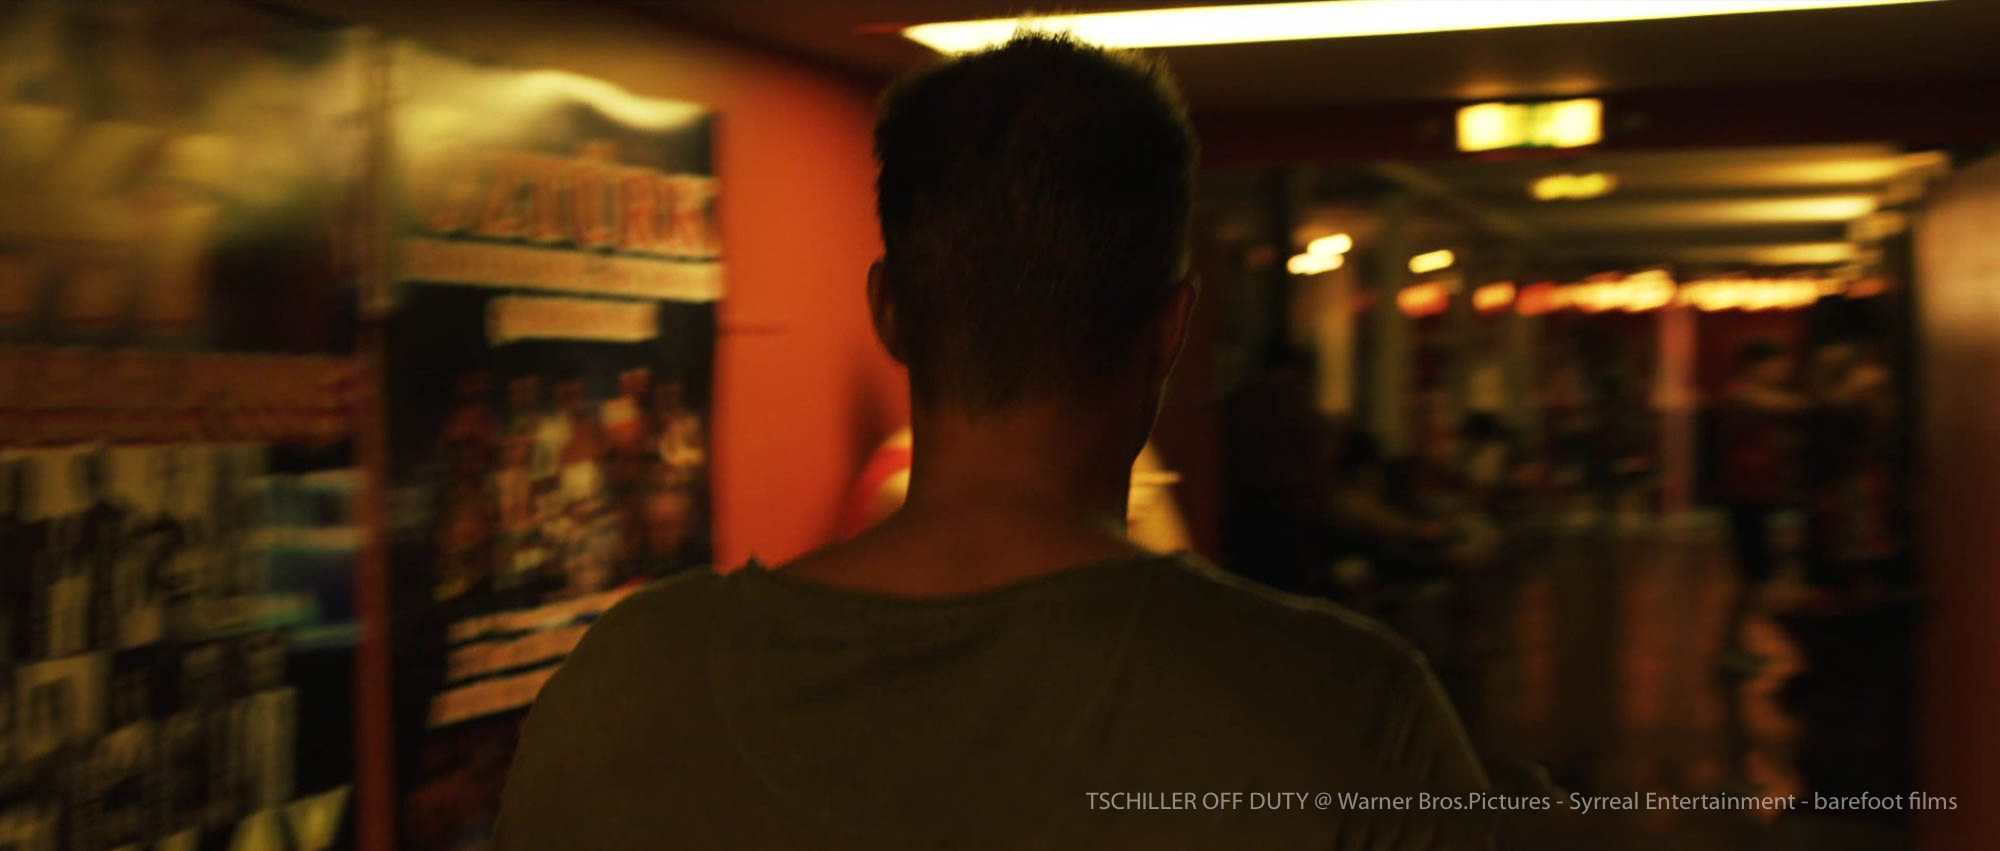 Tschiller off duty Regie Christian Alvart Til Schweiger Thomas FreudenthalSzenenbild Production Design Hamburg Germany